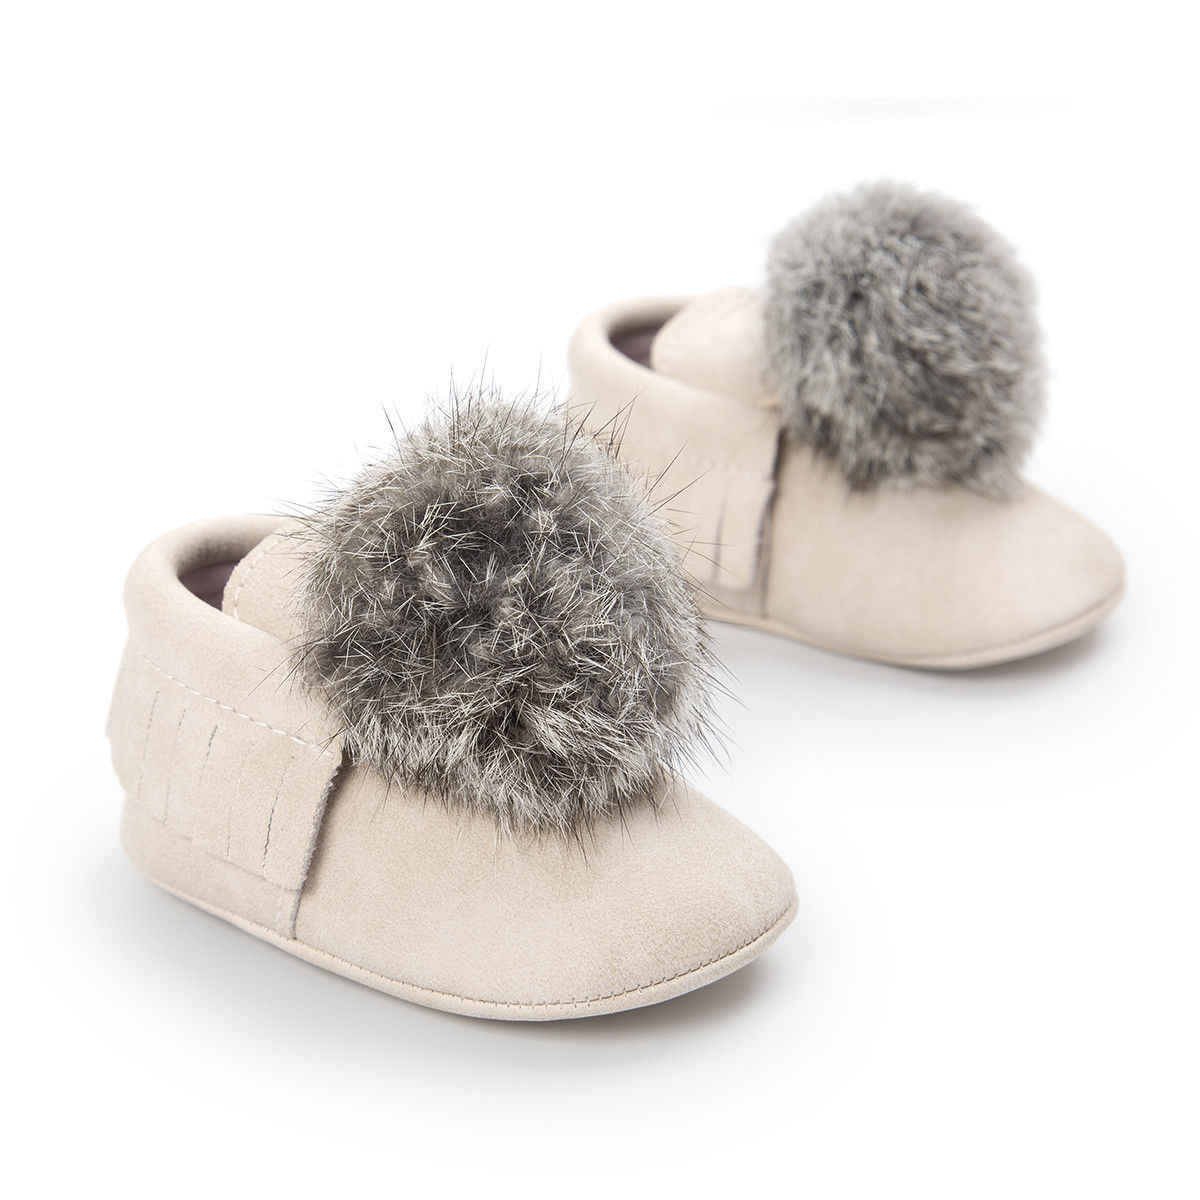 3b7f7d8feaba ... 2018 Brand Newborn Baby Girls Pom Pom Shoes Cute Boots Warm Slippers  Crib Shoes ...